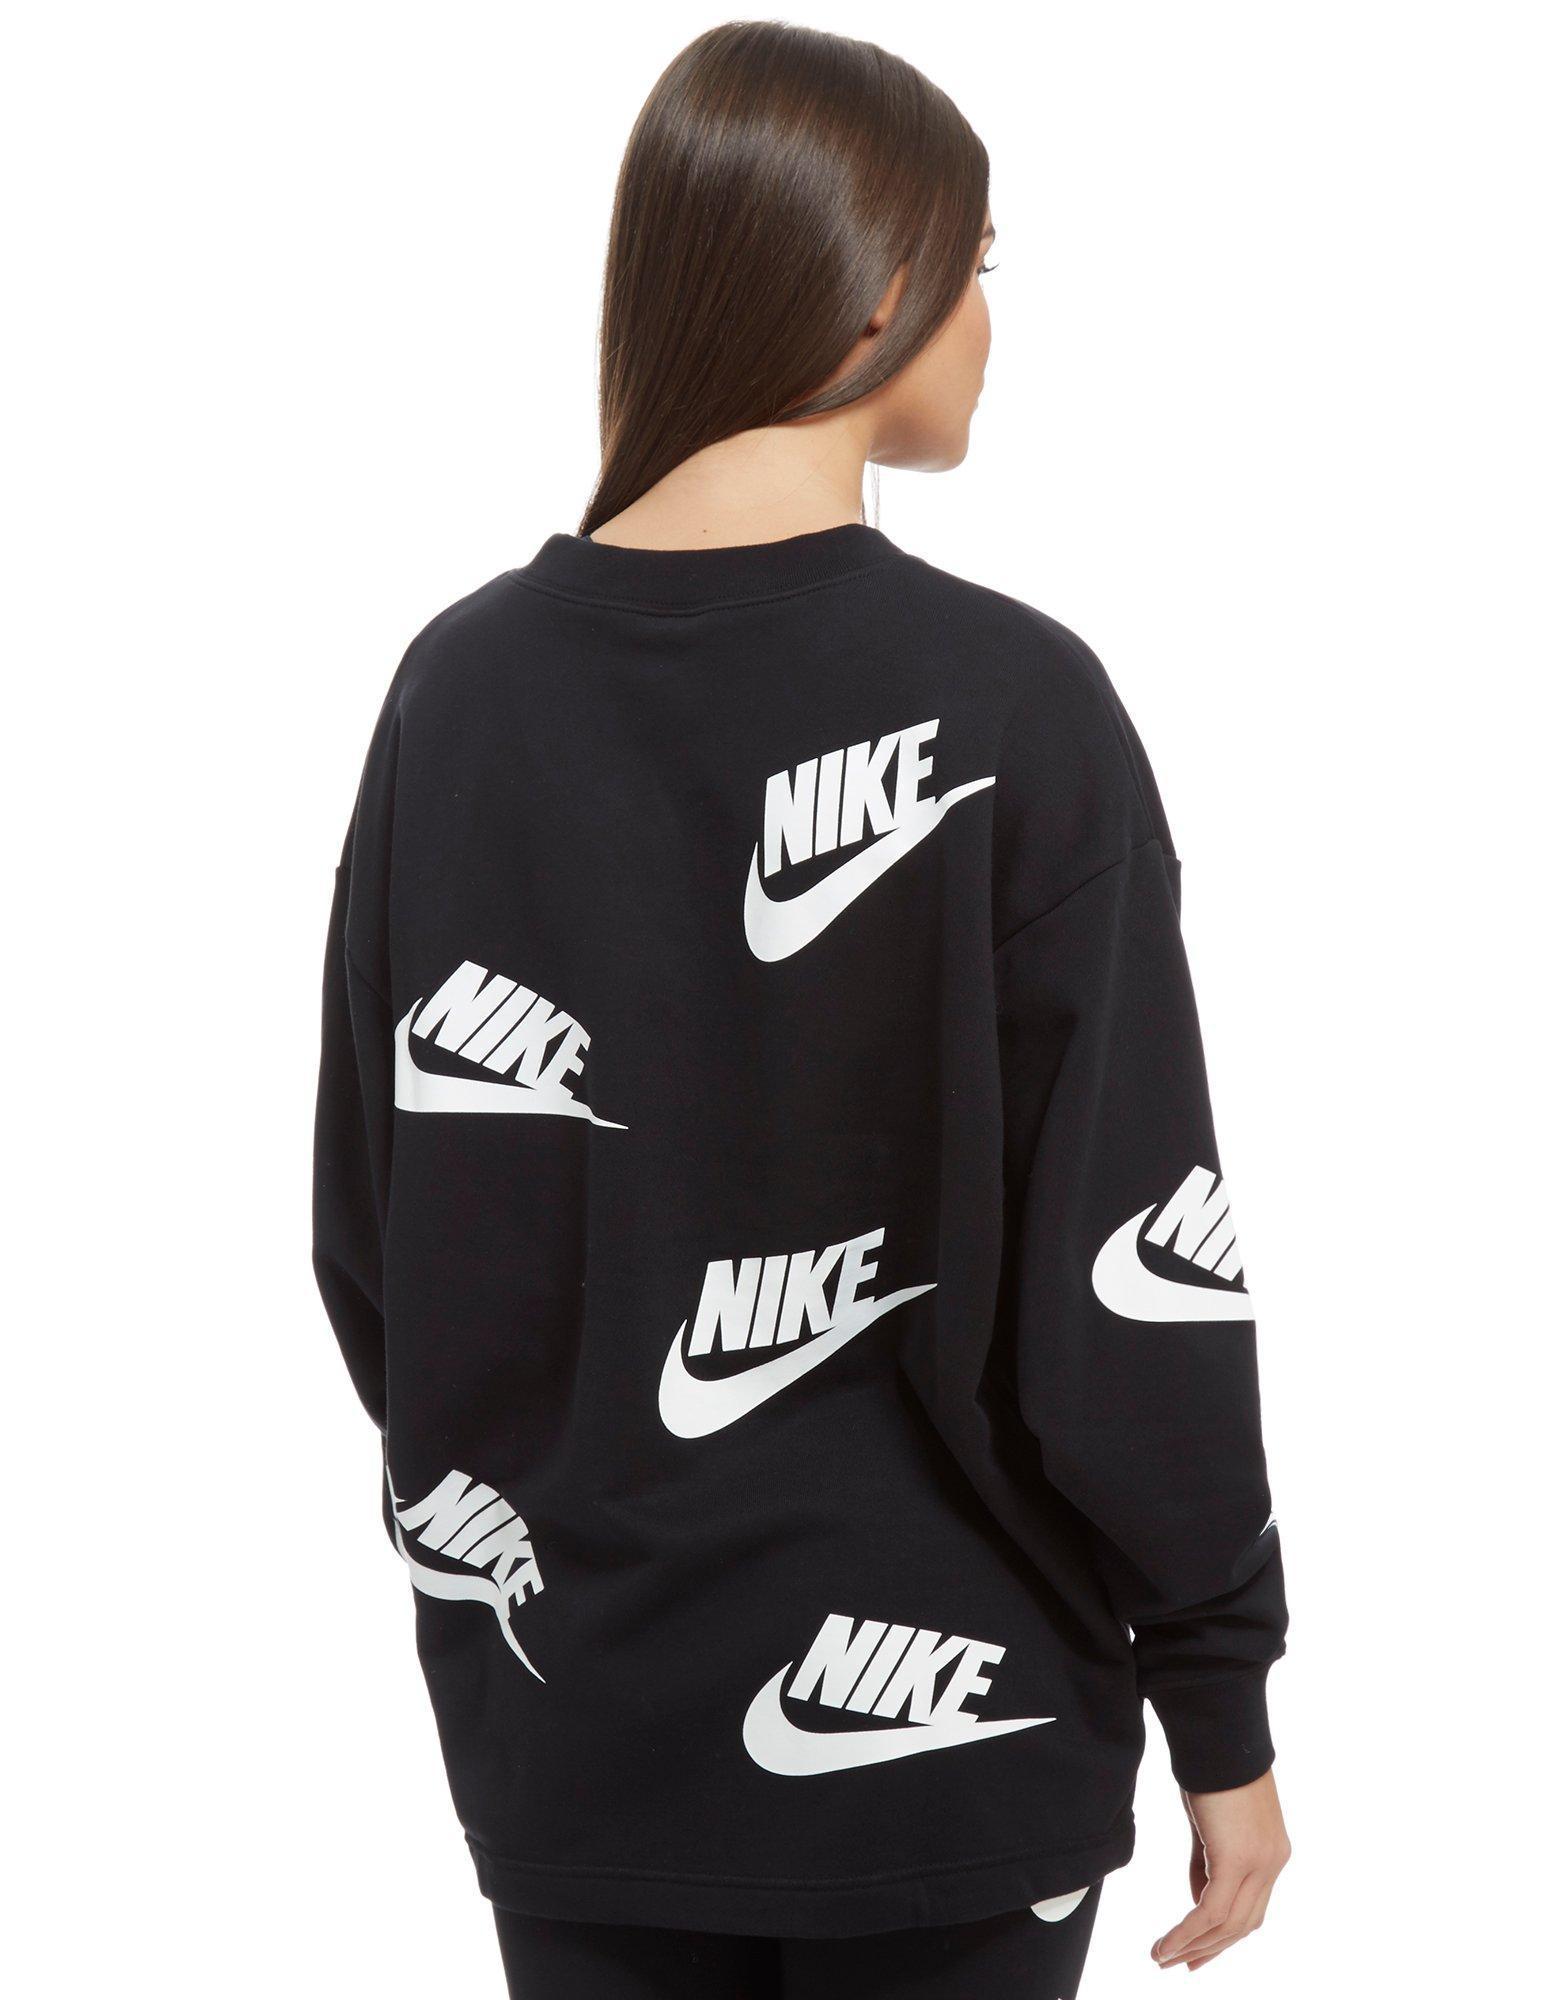 Lyst In Sweatshirt Print Crew Futura Black Nike All Over rC0xwqraB